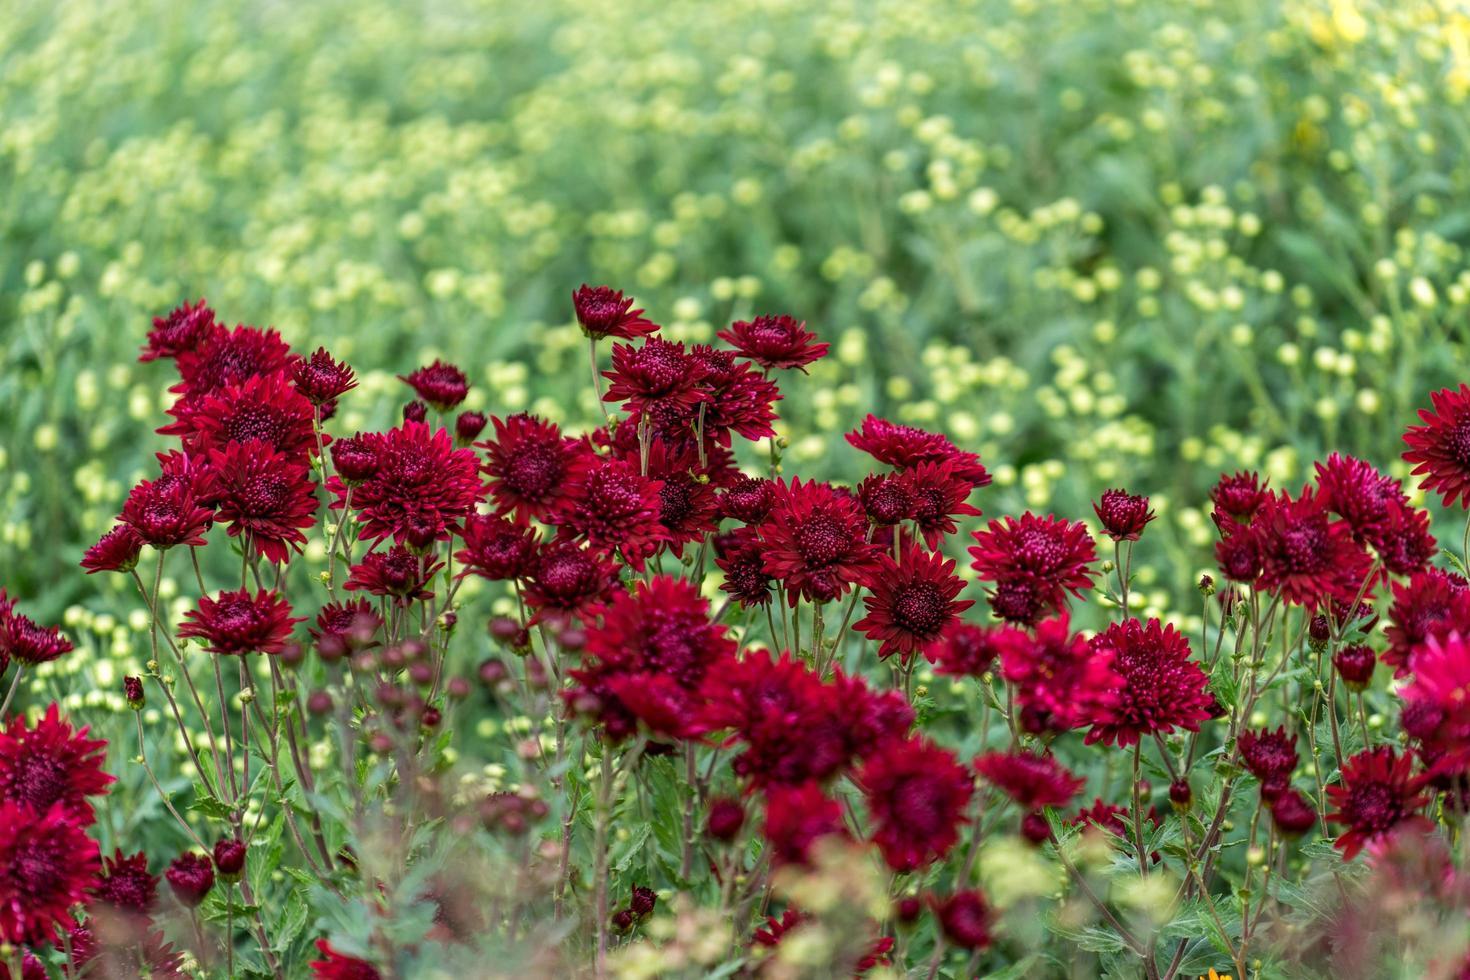 blommig bakgrund med en vacker vinröd krysantemum foto